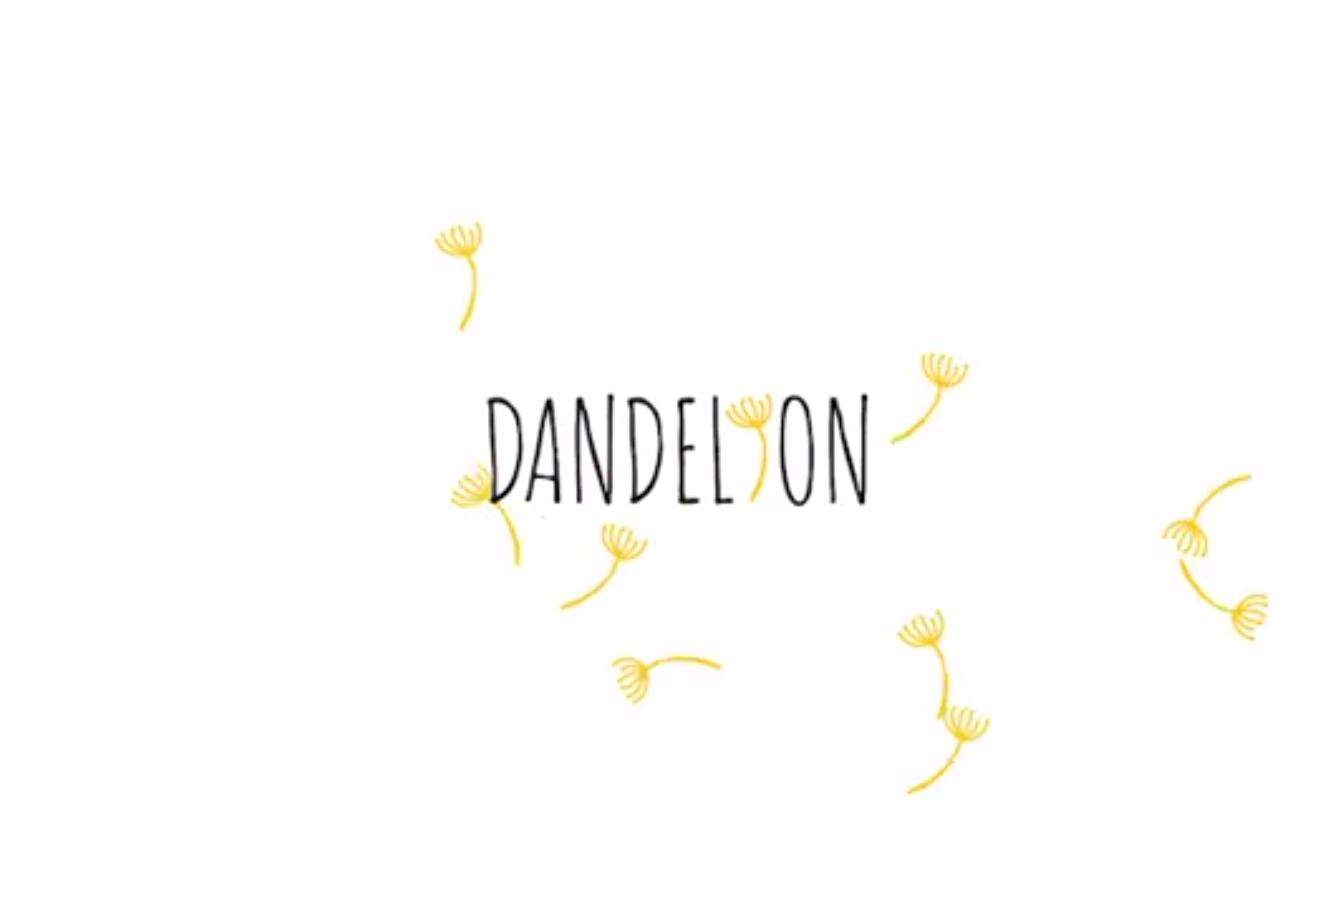 Dandelion Dance company – Promotional video